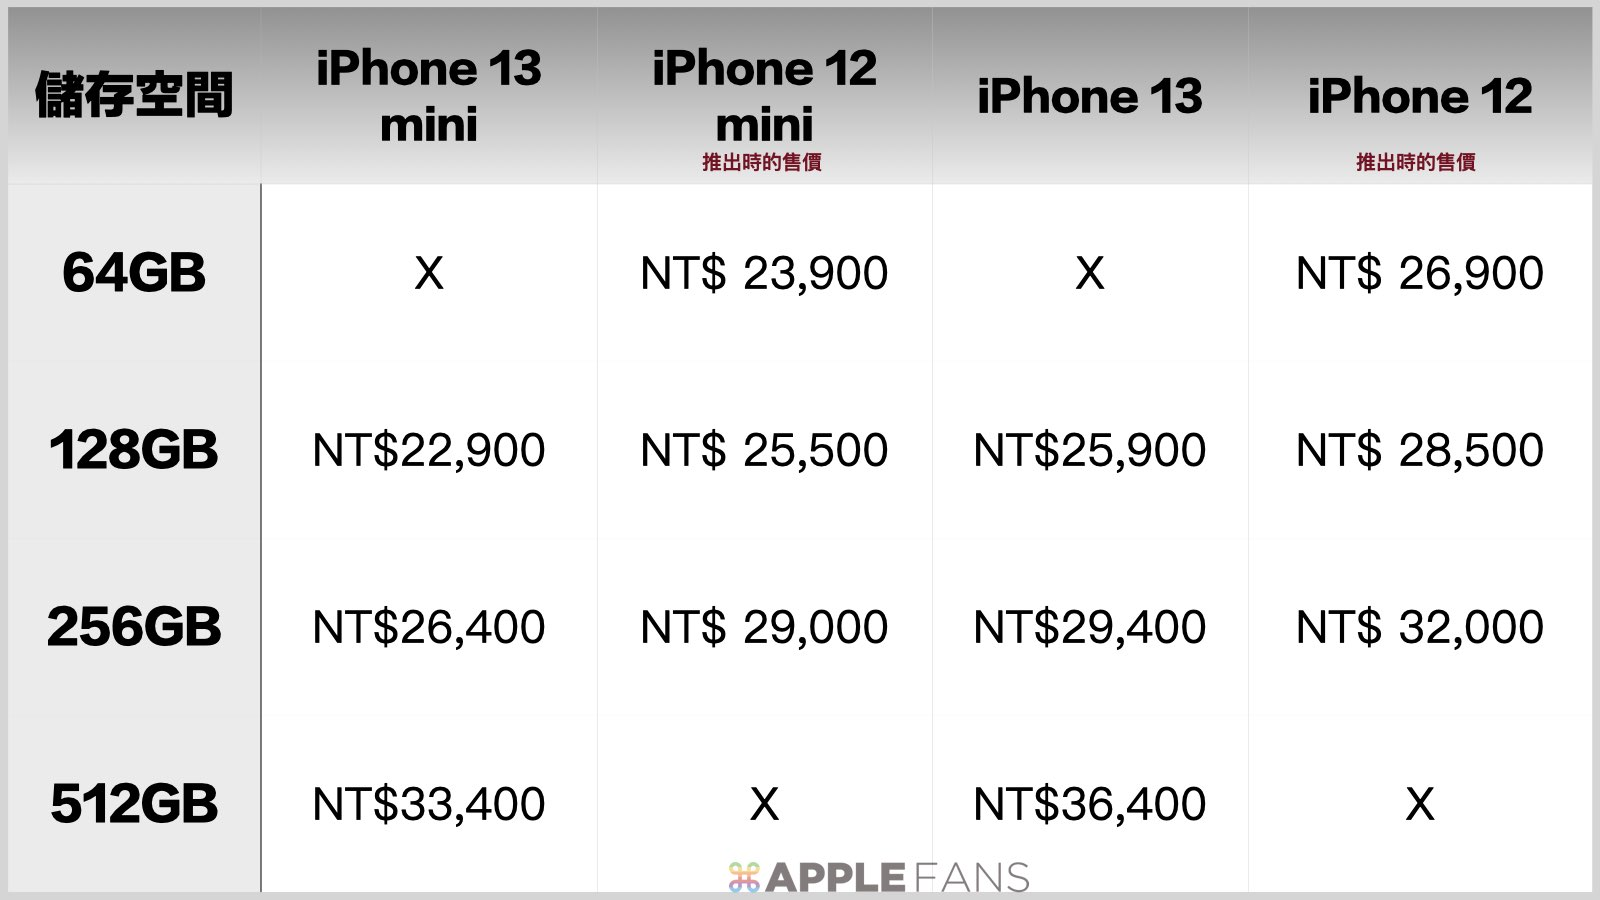 價格比一比:iPhone 13 mini : iPhone 13 : iPhone 12 mimi : iPhone 12 : iPhone 11.002